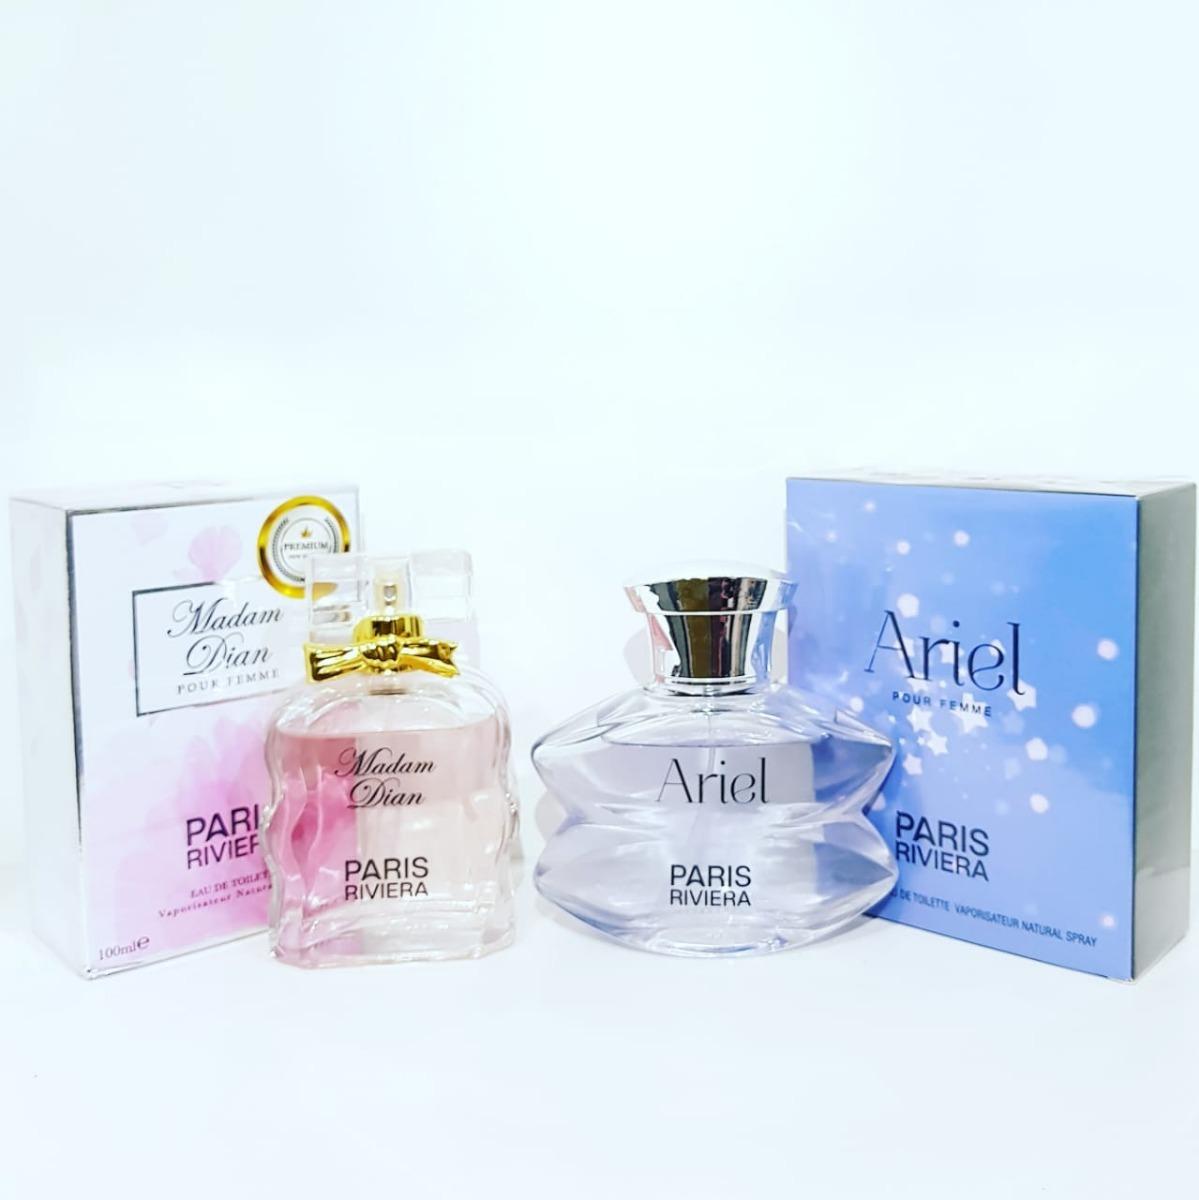 beca1d94194 Kit Perfume La Rive Miss Dior E Angel Referencias Promoção - R  59 ...